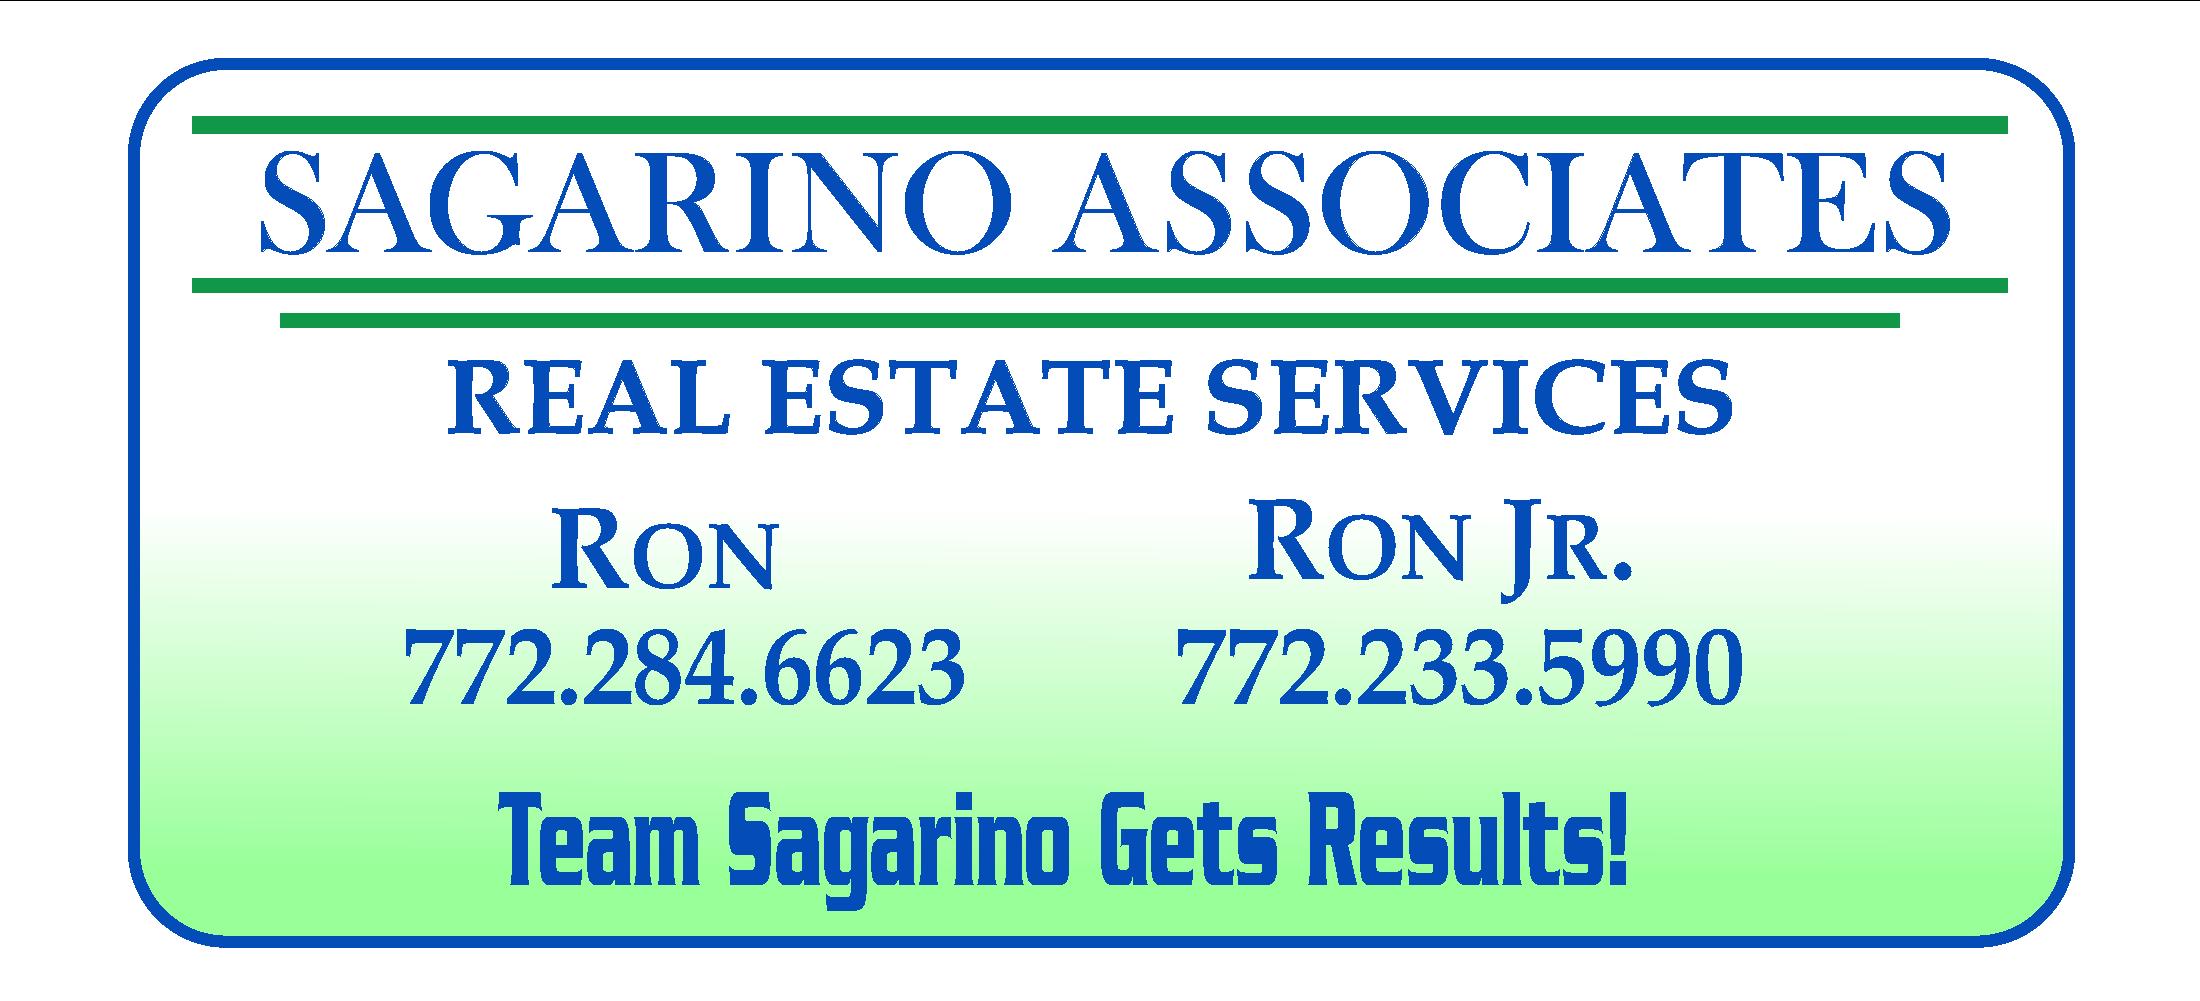 Ron Sagarino and Associates